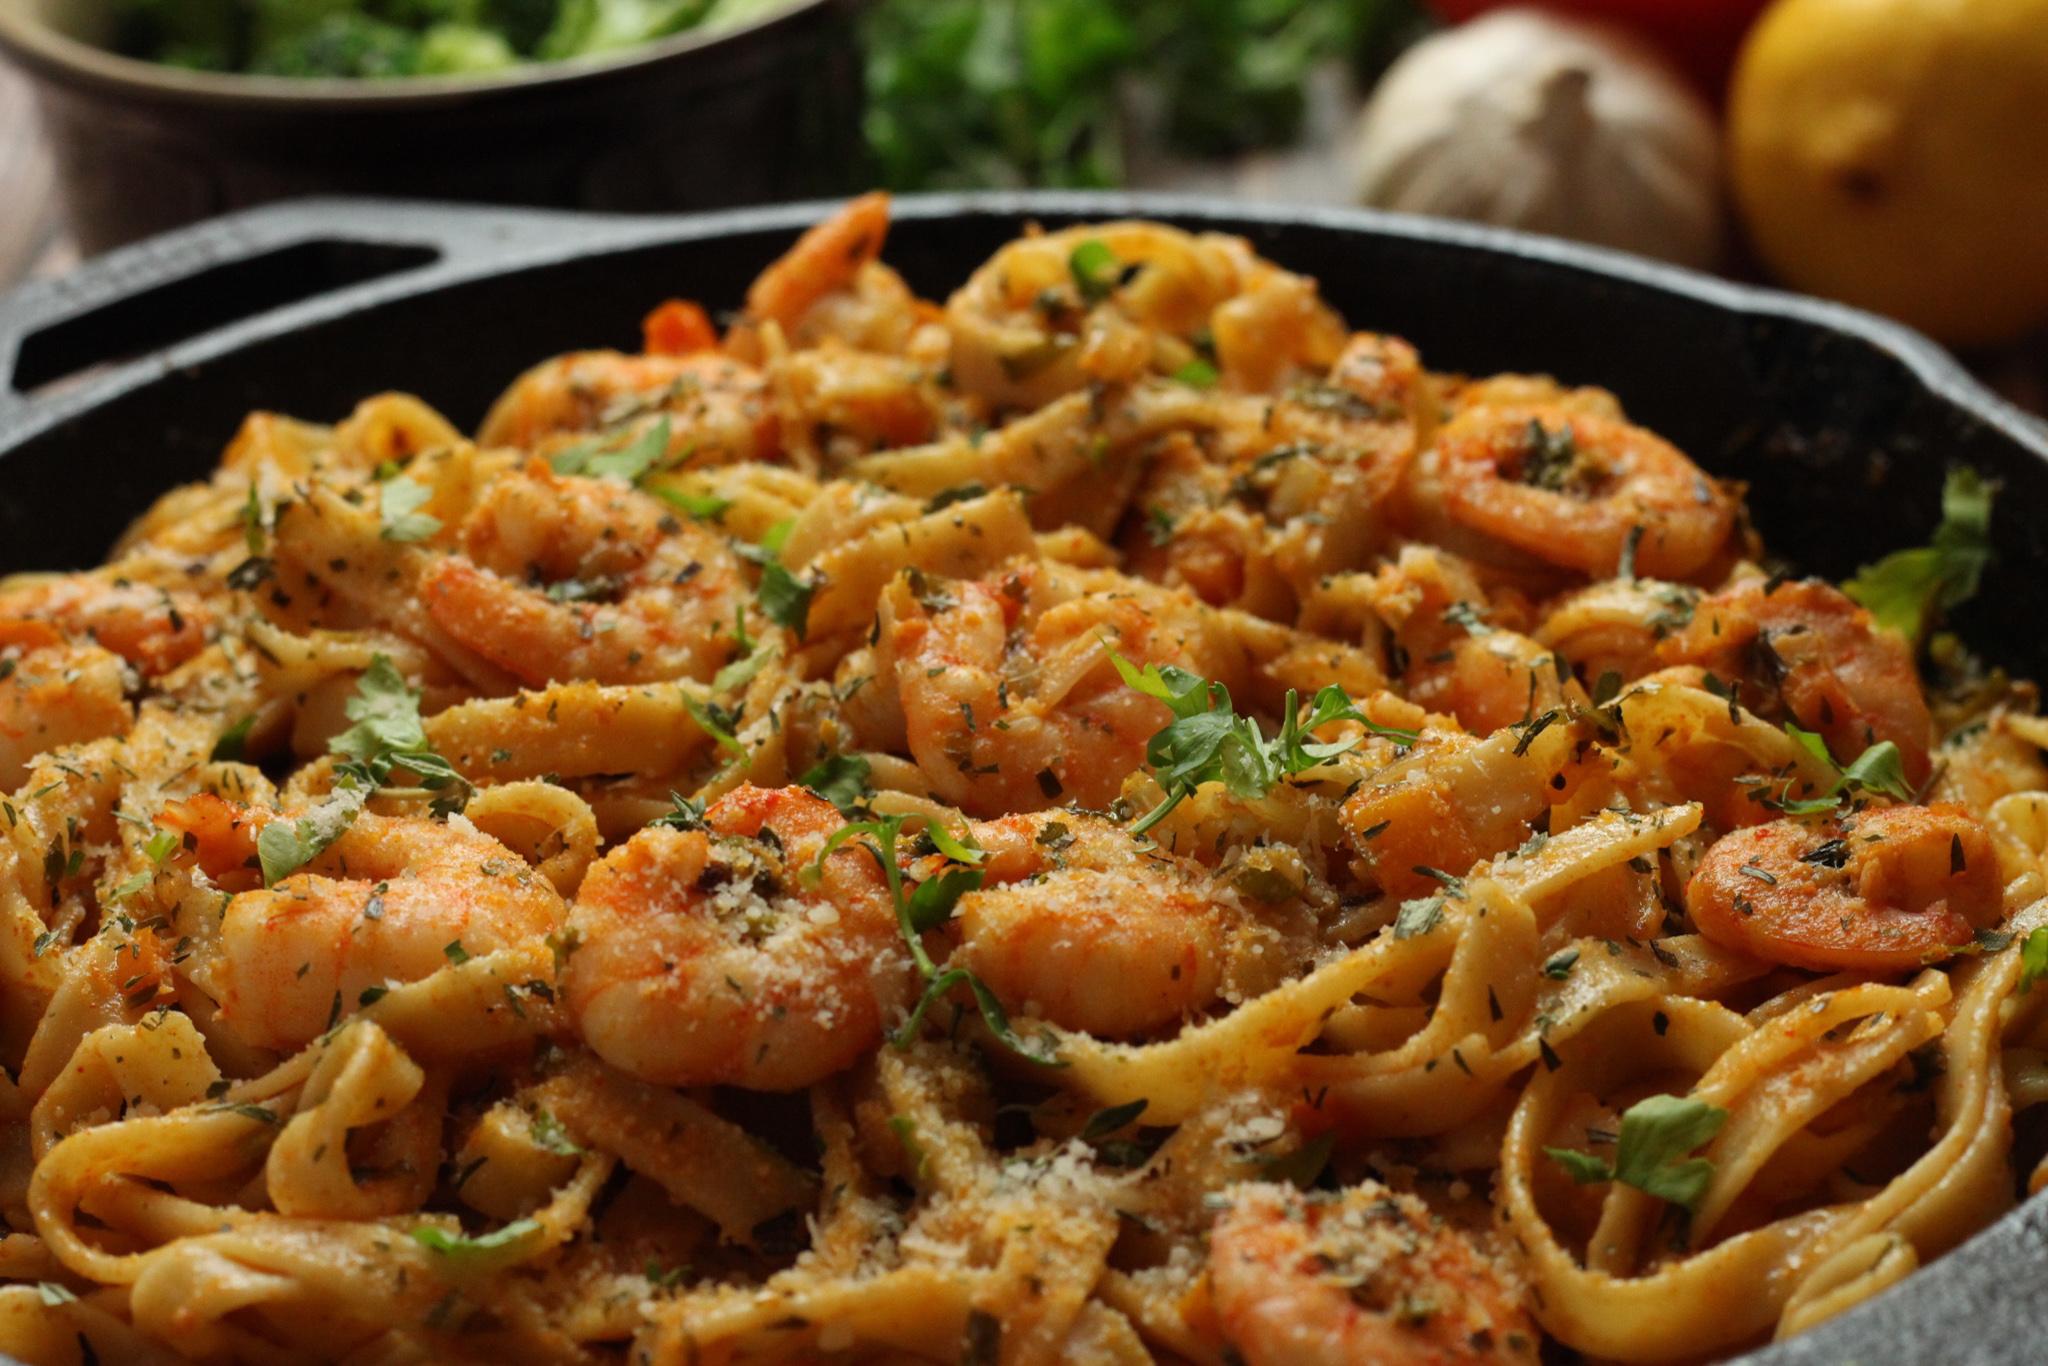 A Quick and Easy Smoked Garlic Shrimp Pasta